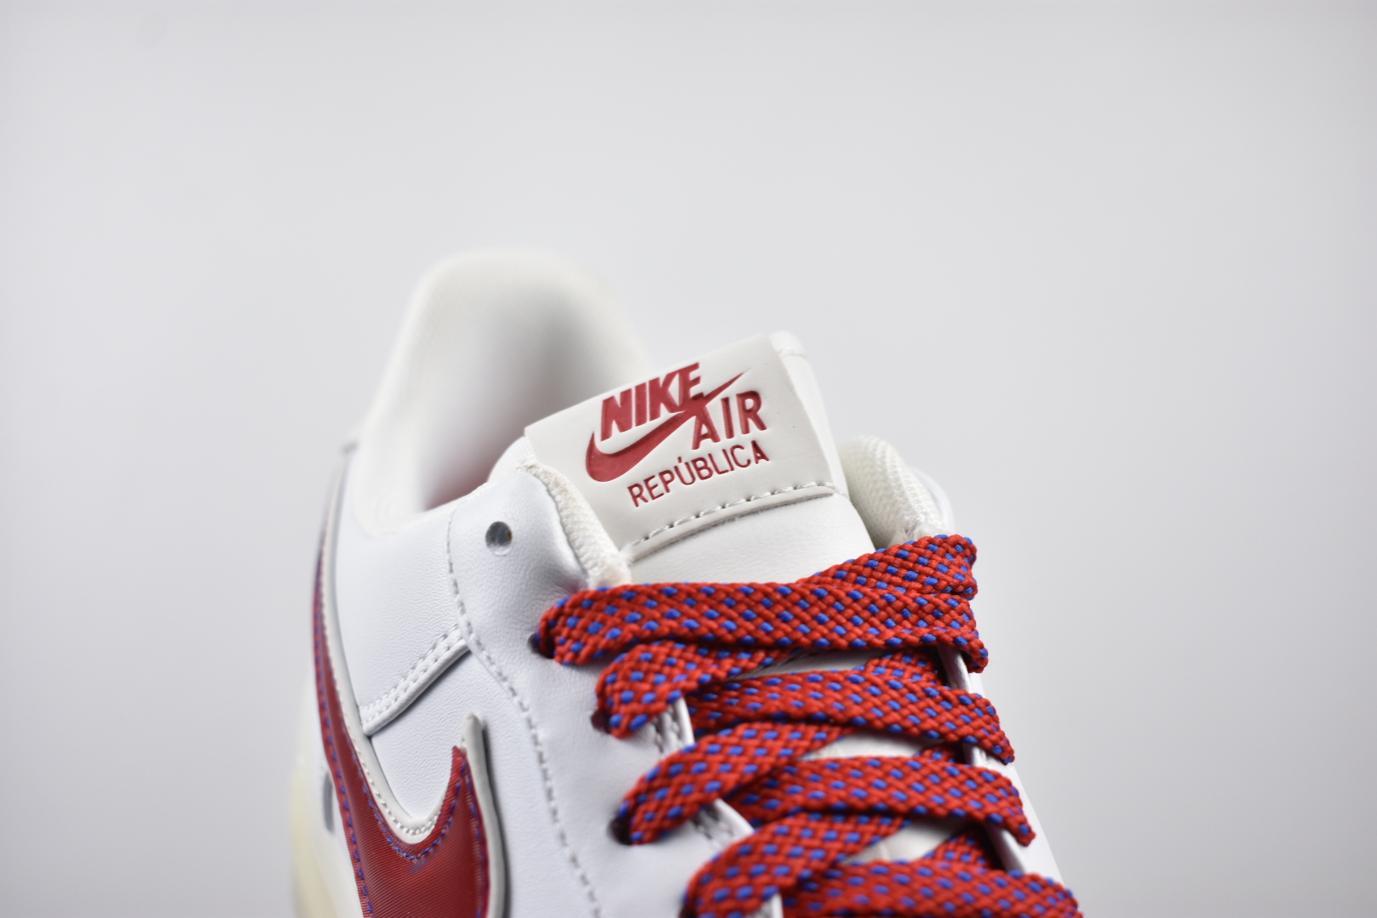 Nike Air Force 1 Low De Lo Mio 8